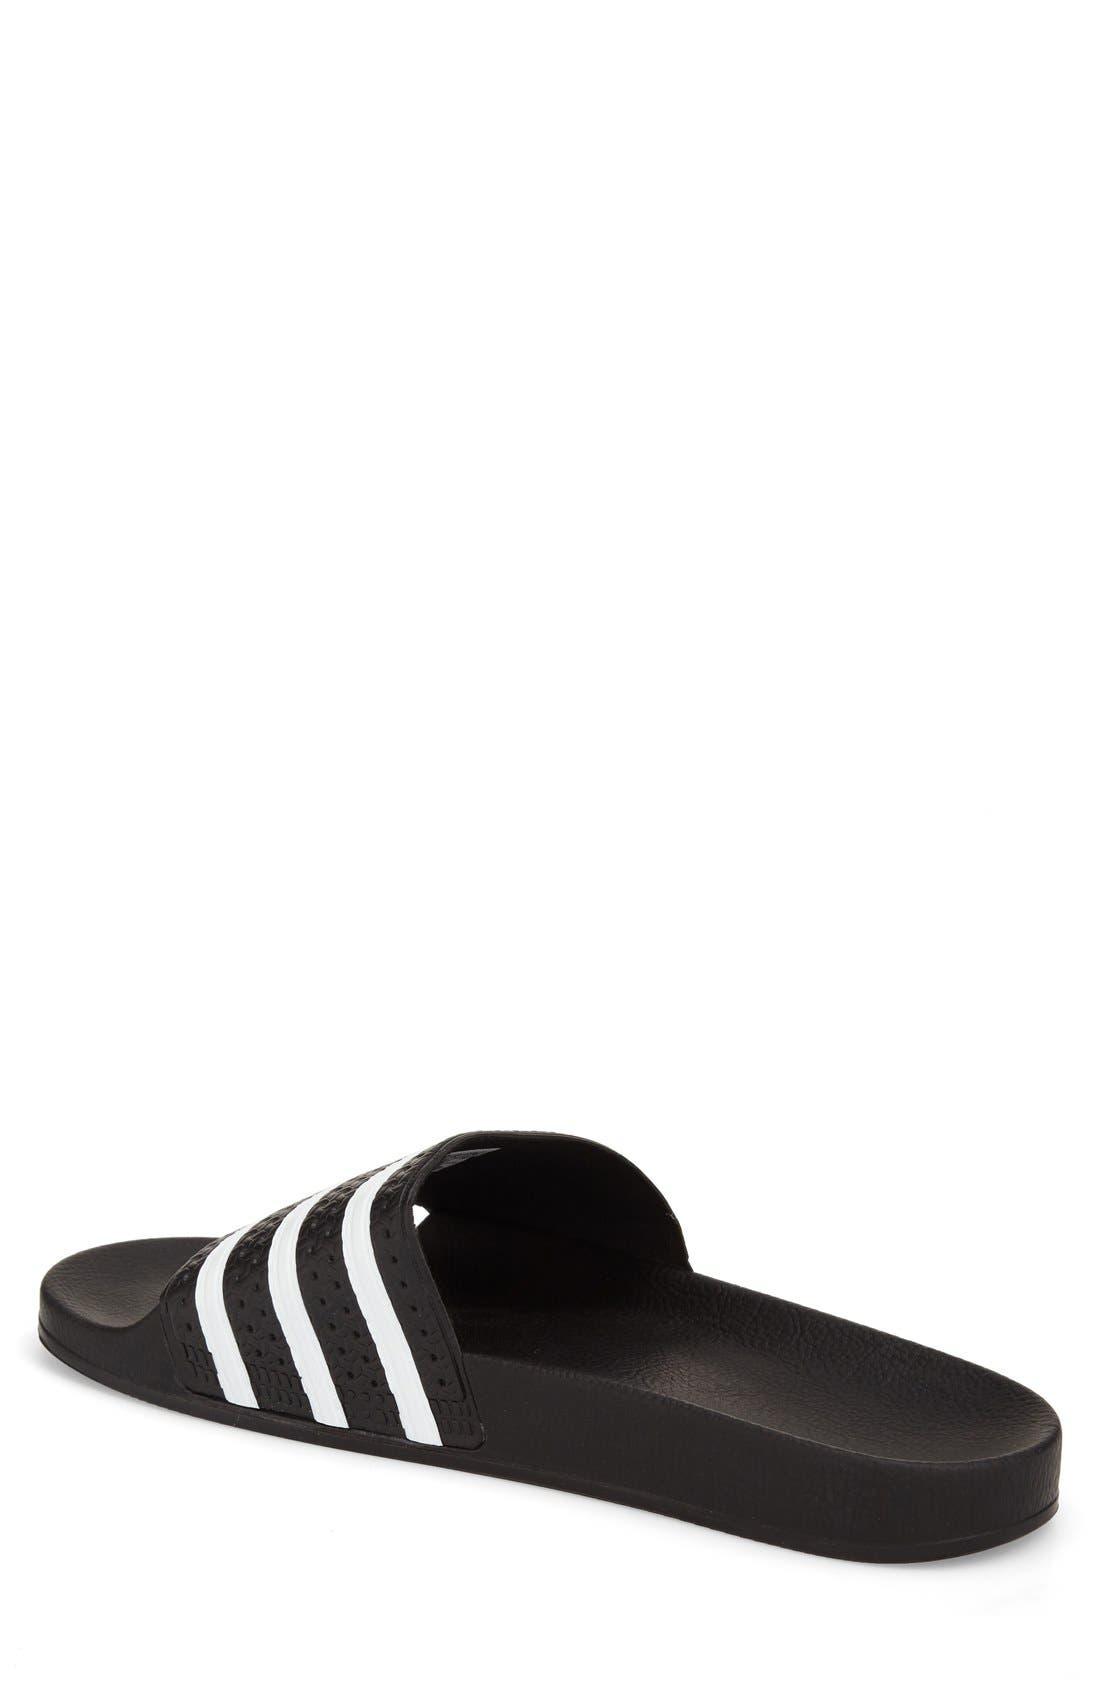 b9f6b466137 Men s Adidas Shoes